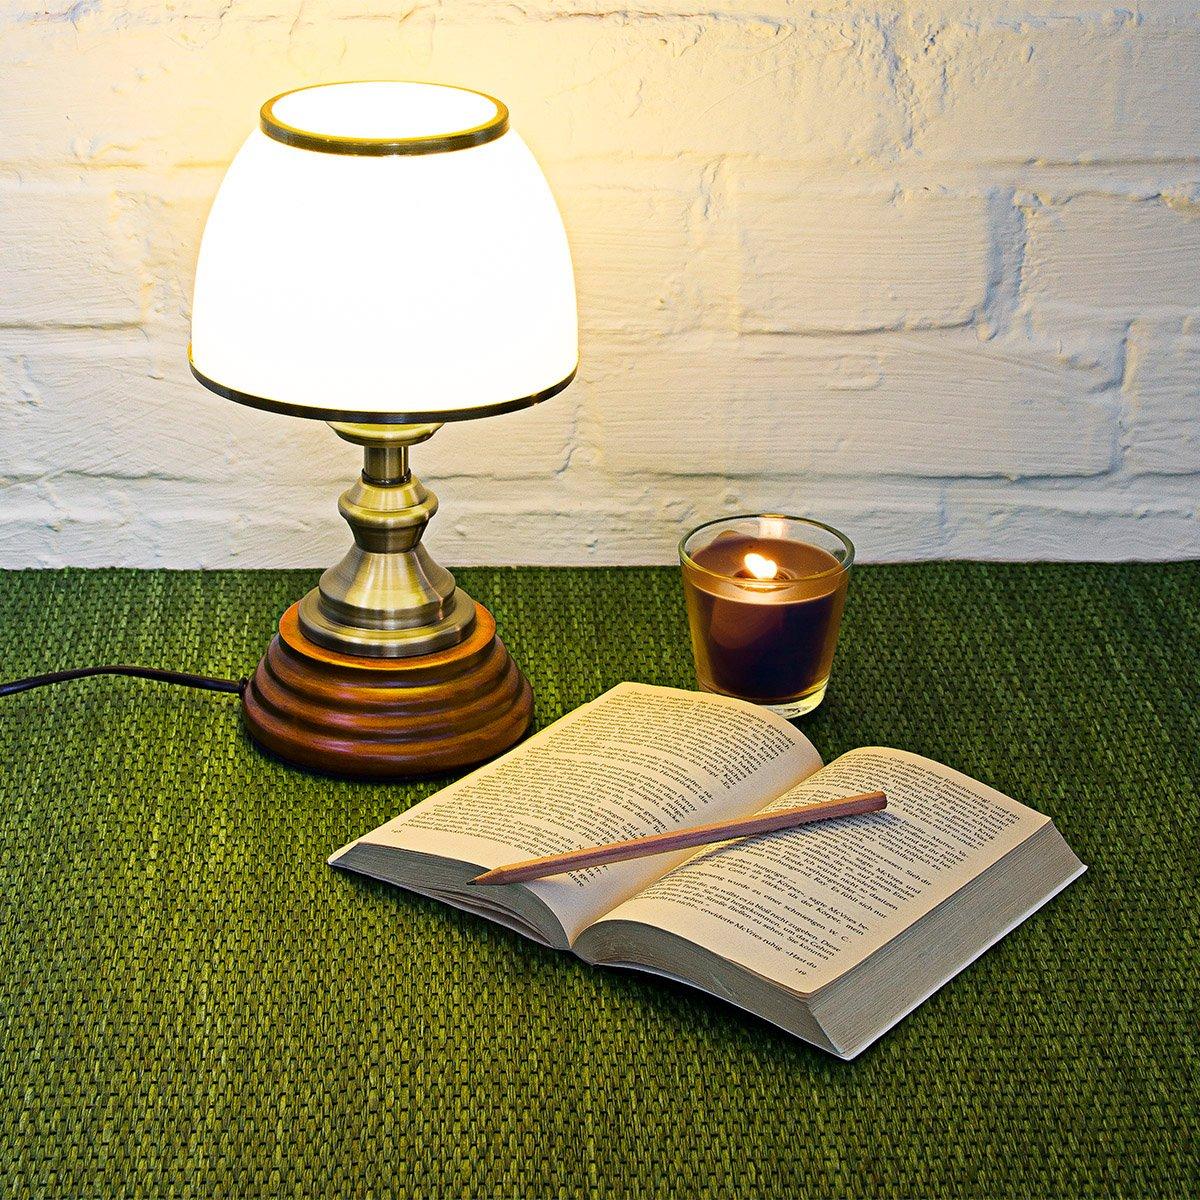 Lettura Luce Soffusa Luce Calda Comodino Relaxdays Lampada da Scrivania Vetro Bianco